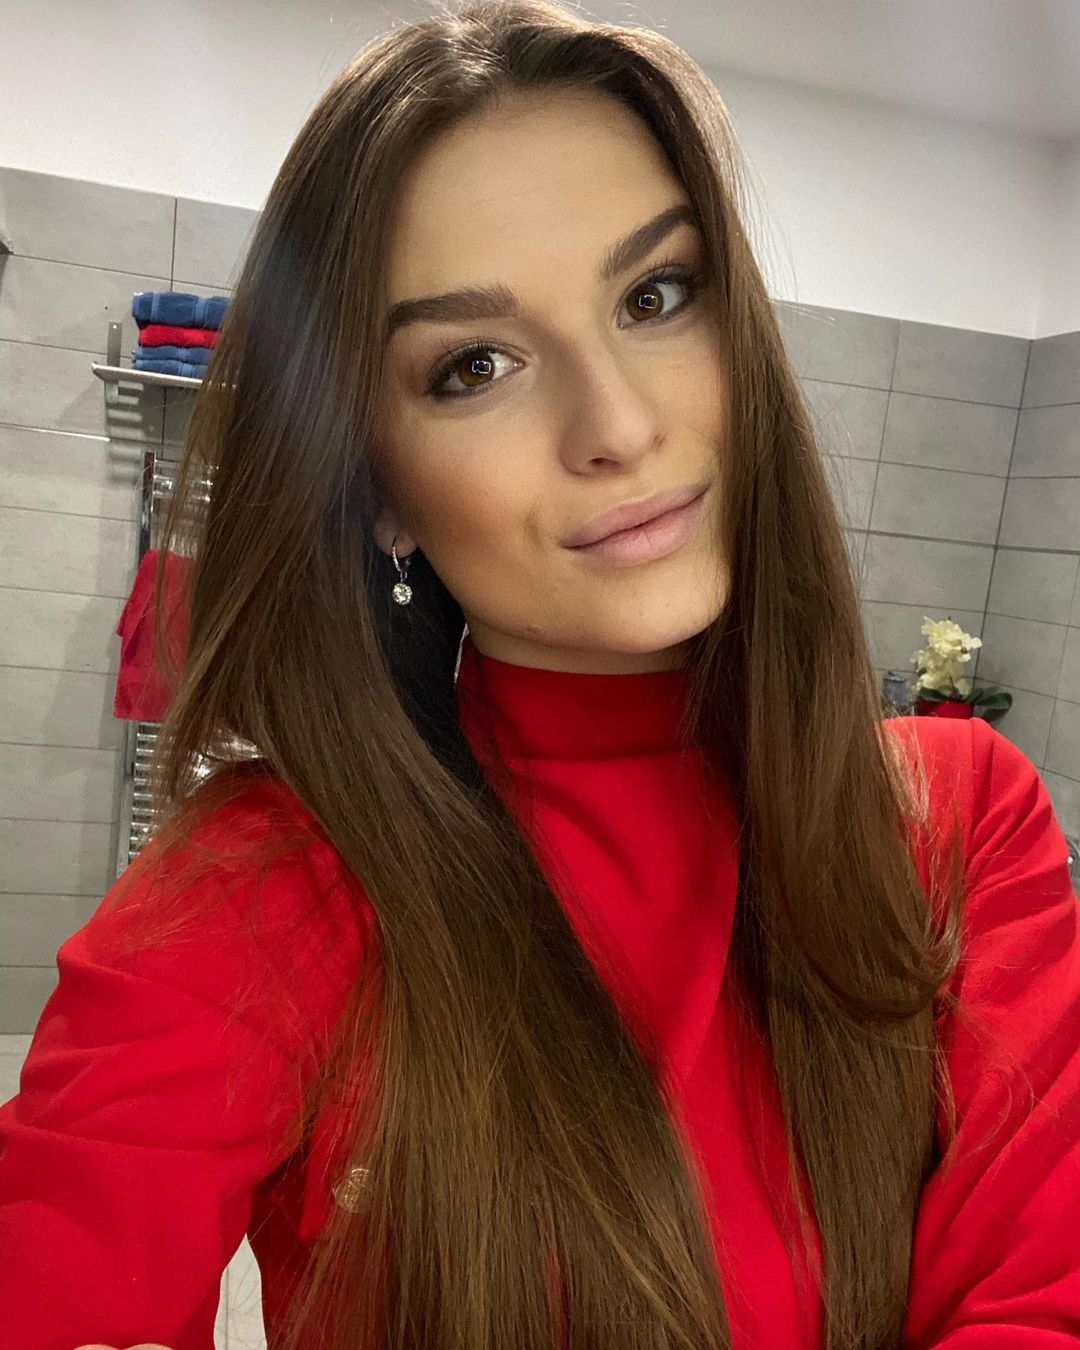 Dominika-Vinsova-Wallpapers-Insta-Fit-Bio-2